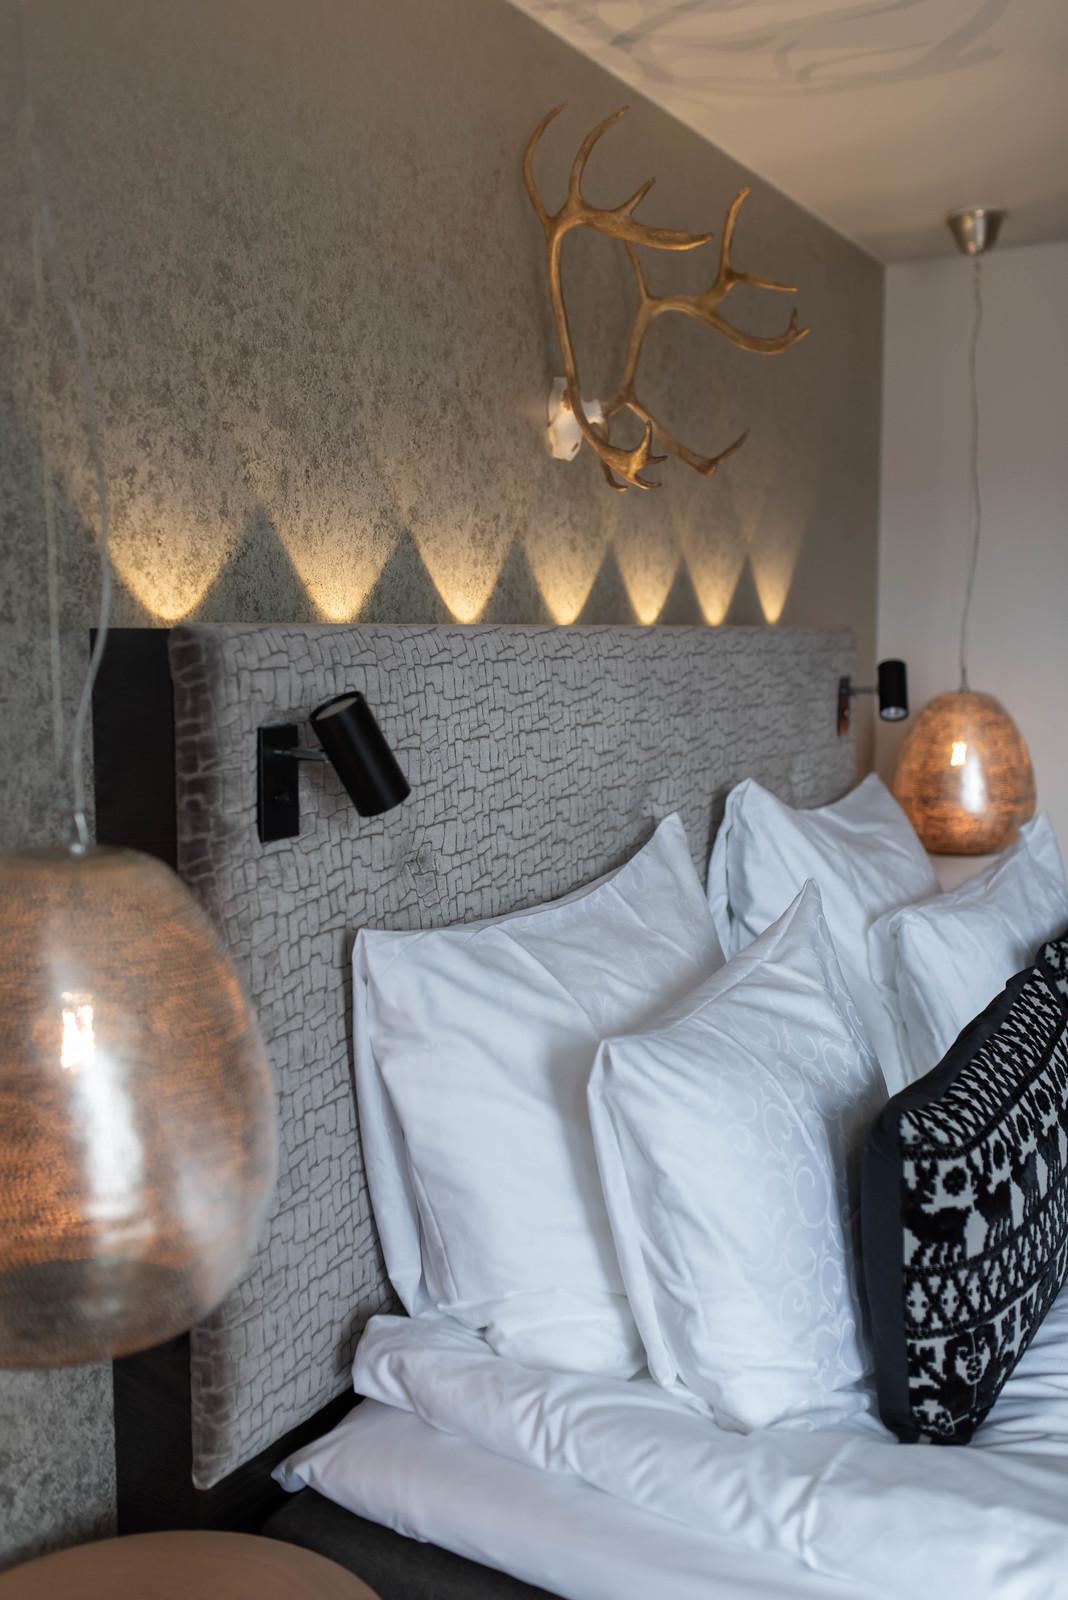 lapland hotels bulevardi bed